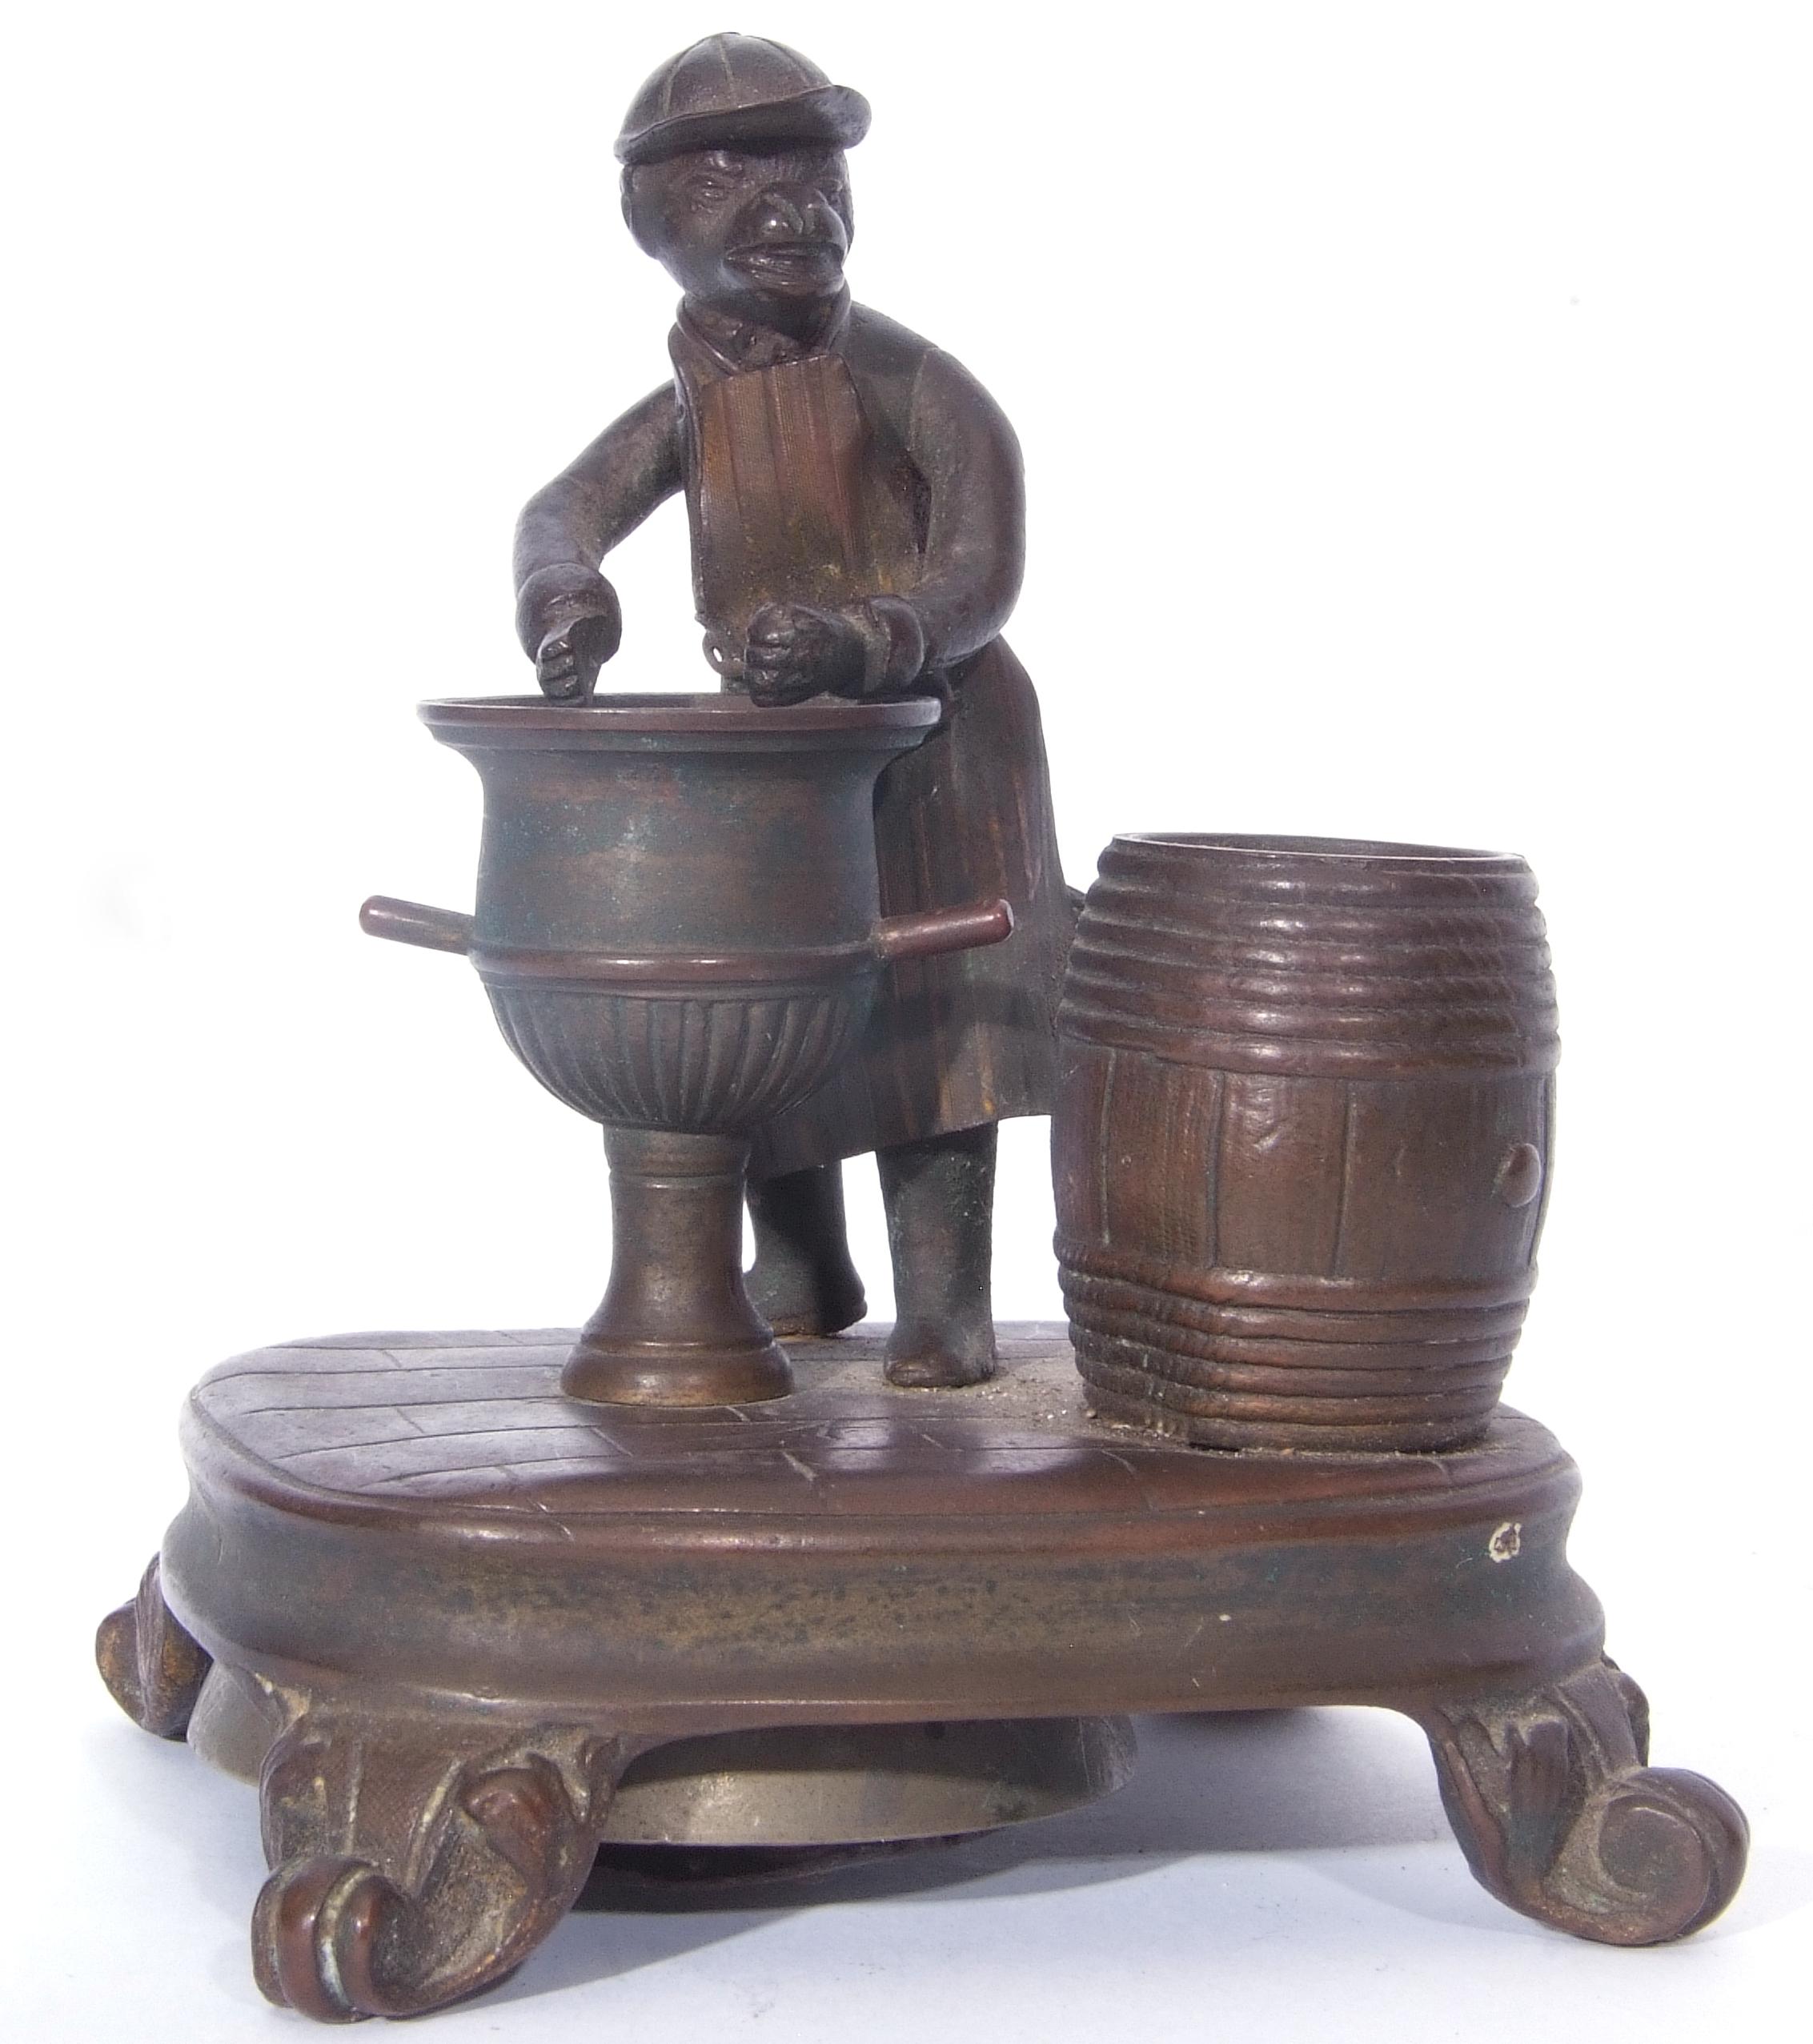 Antique bronze desk bell, a model of a monkey - Image 8 of 11